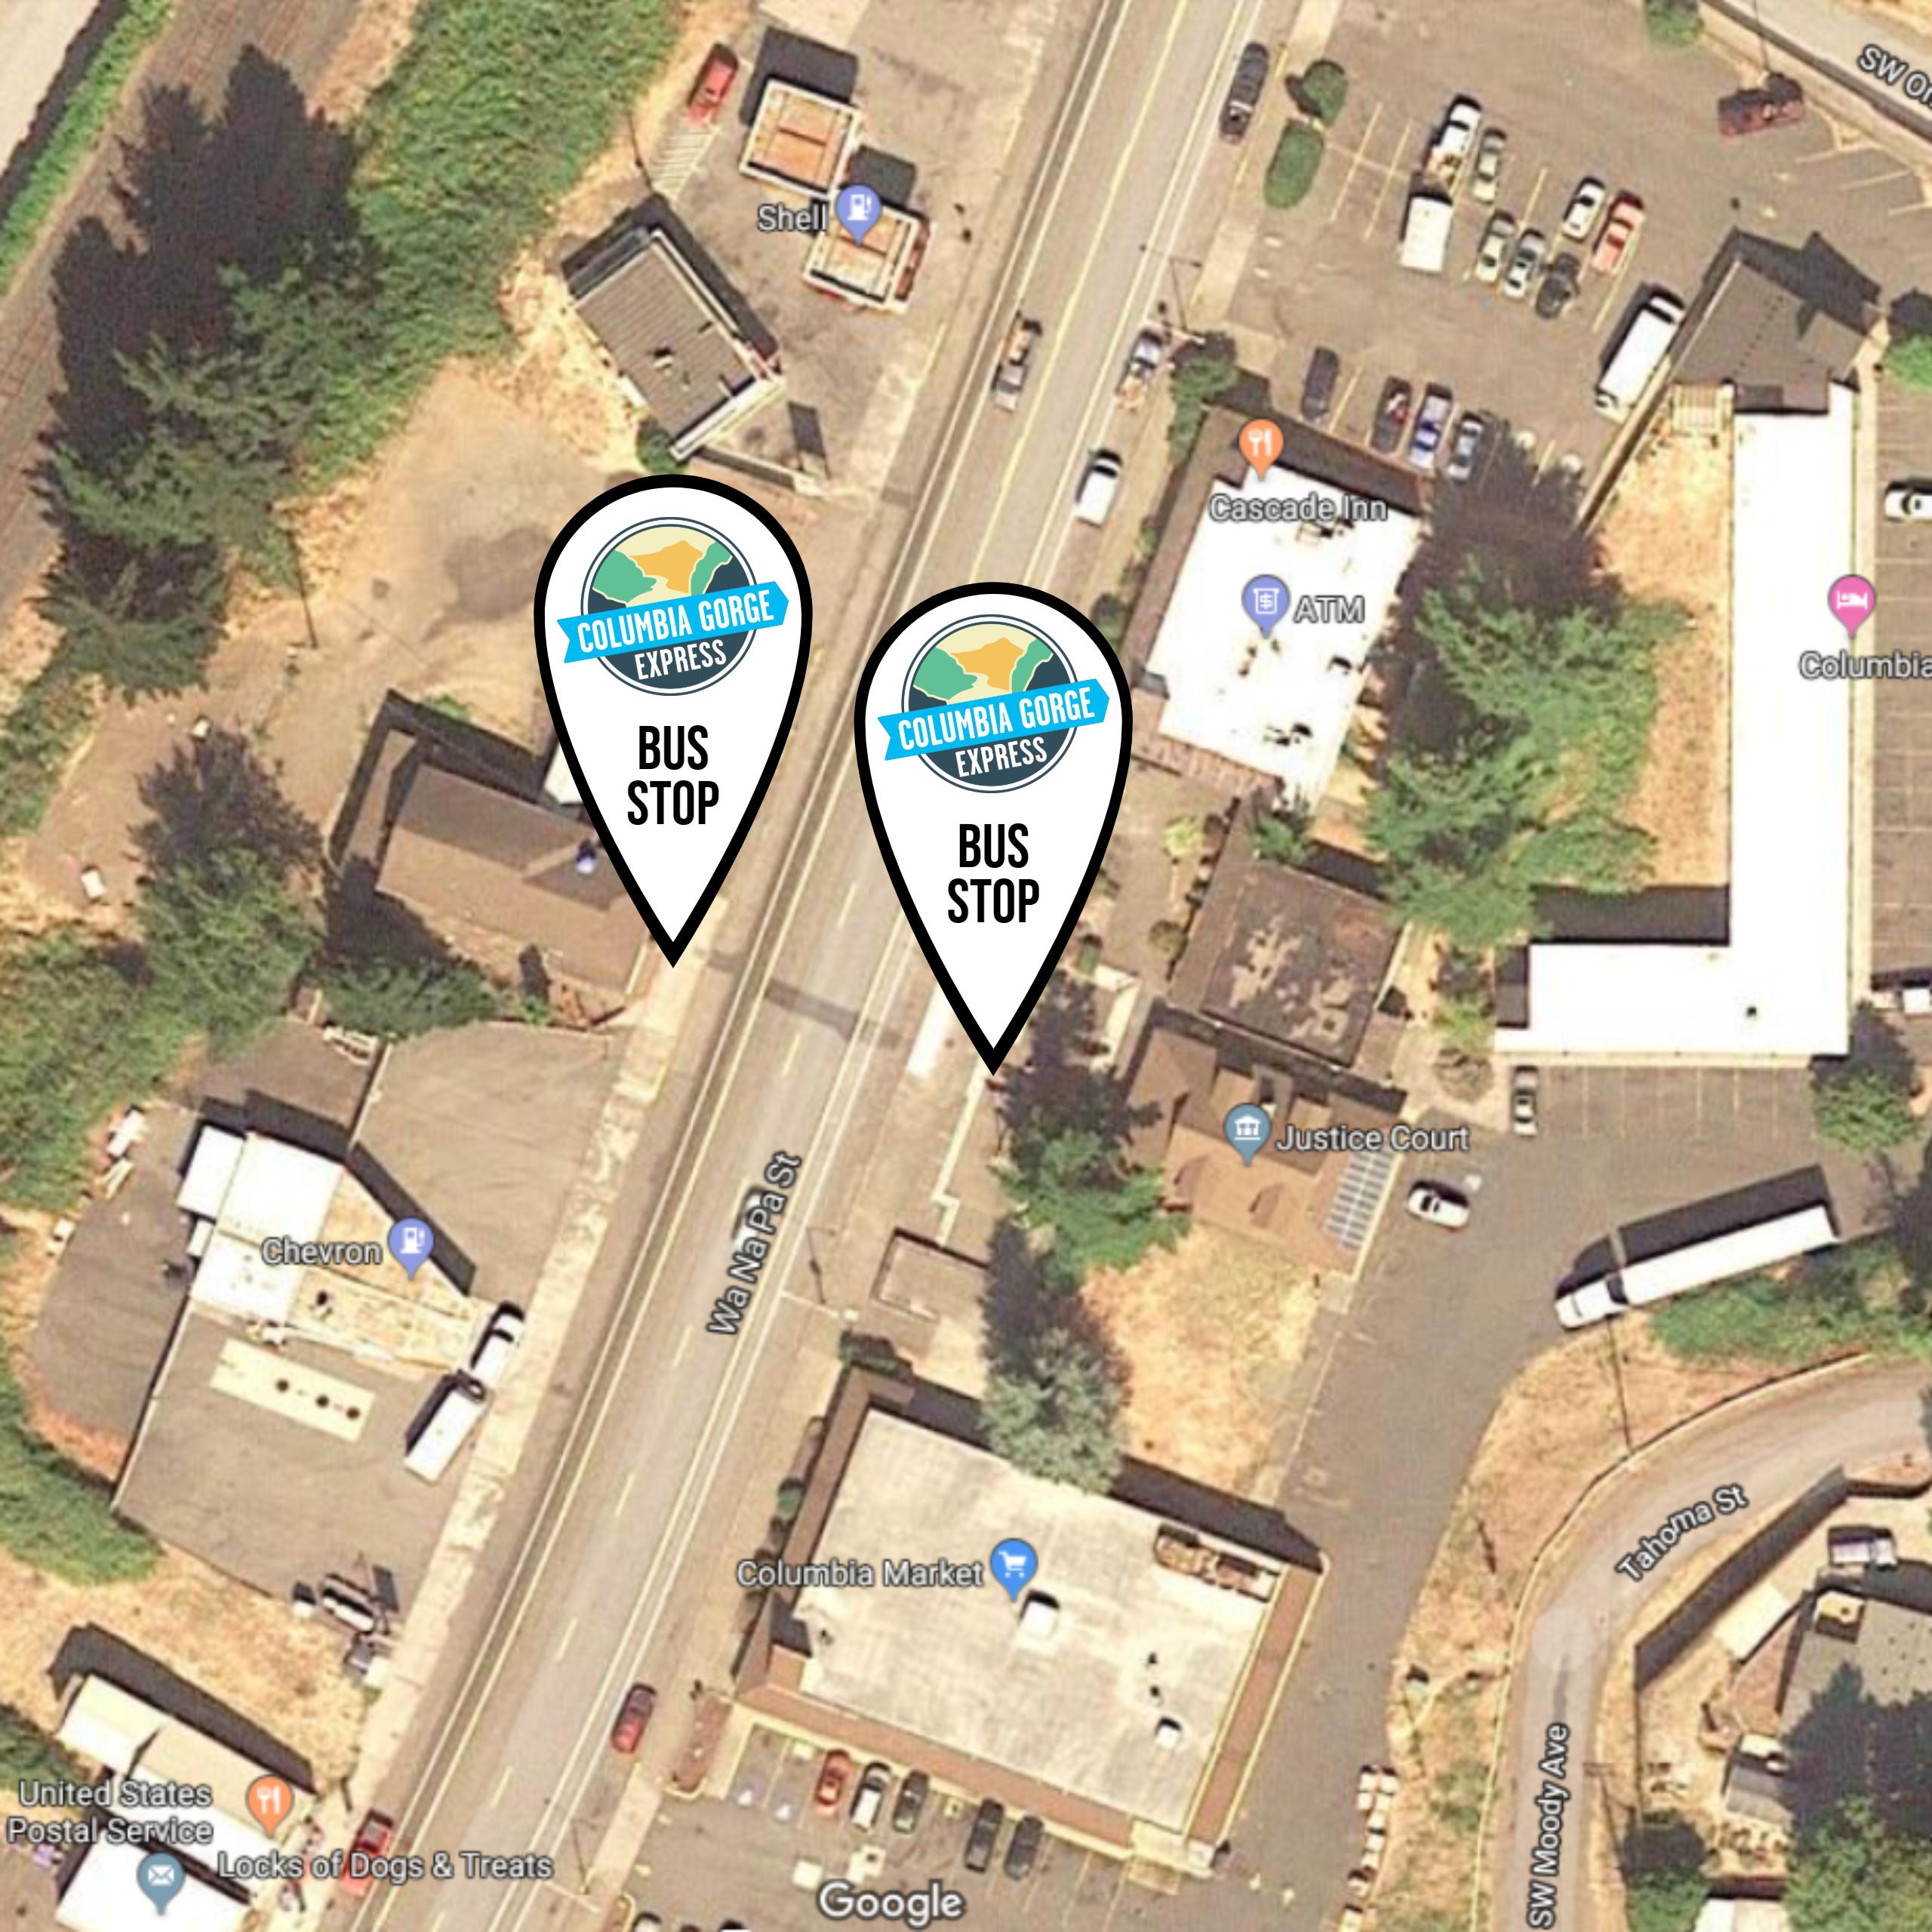 Columbia Gorge Express - Columbia Gorge Express Stops on las vegas monorail stops map, atm map, metropolitan map, multi-stop map, subway stop map,